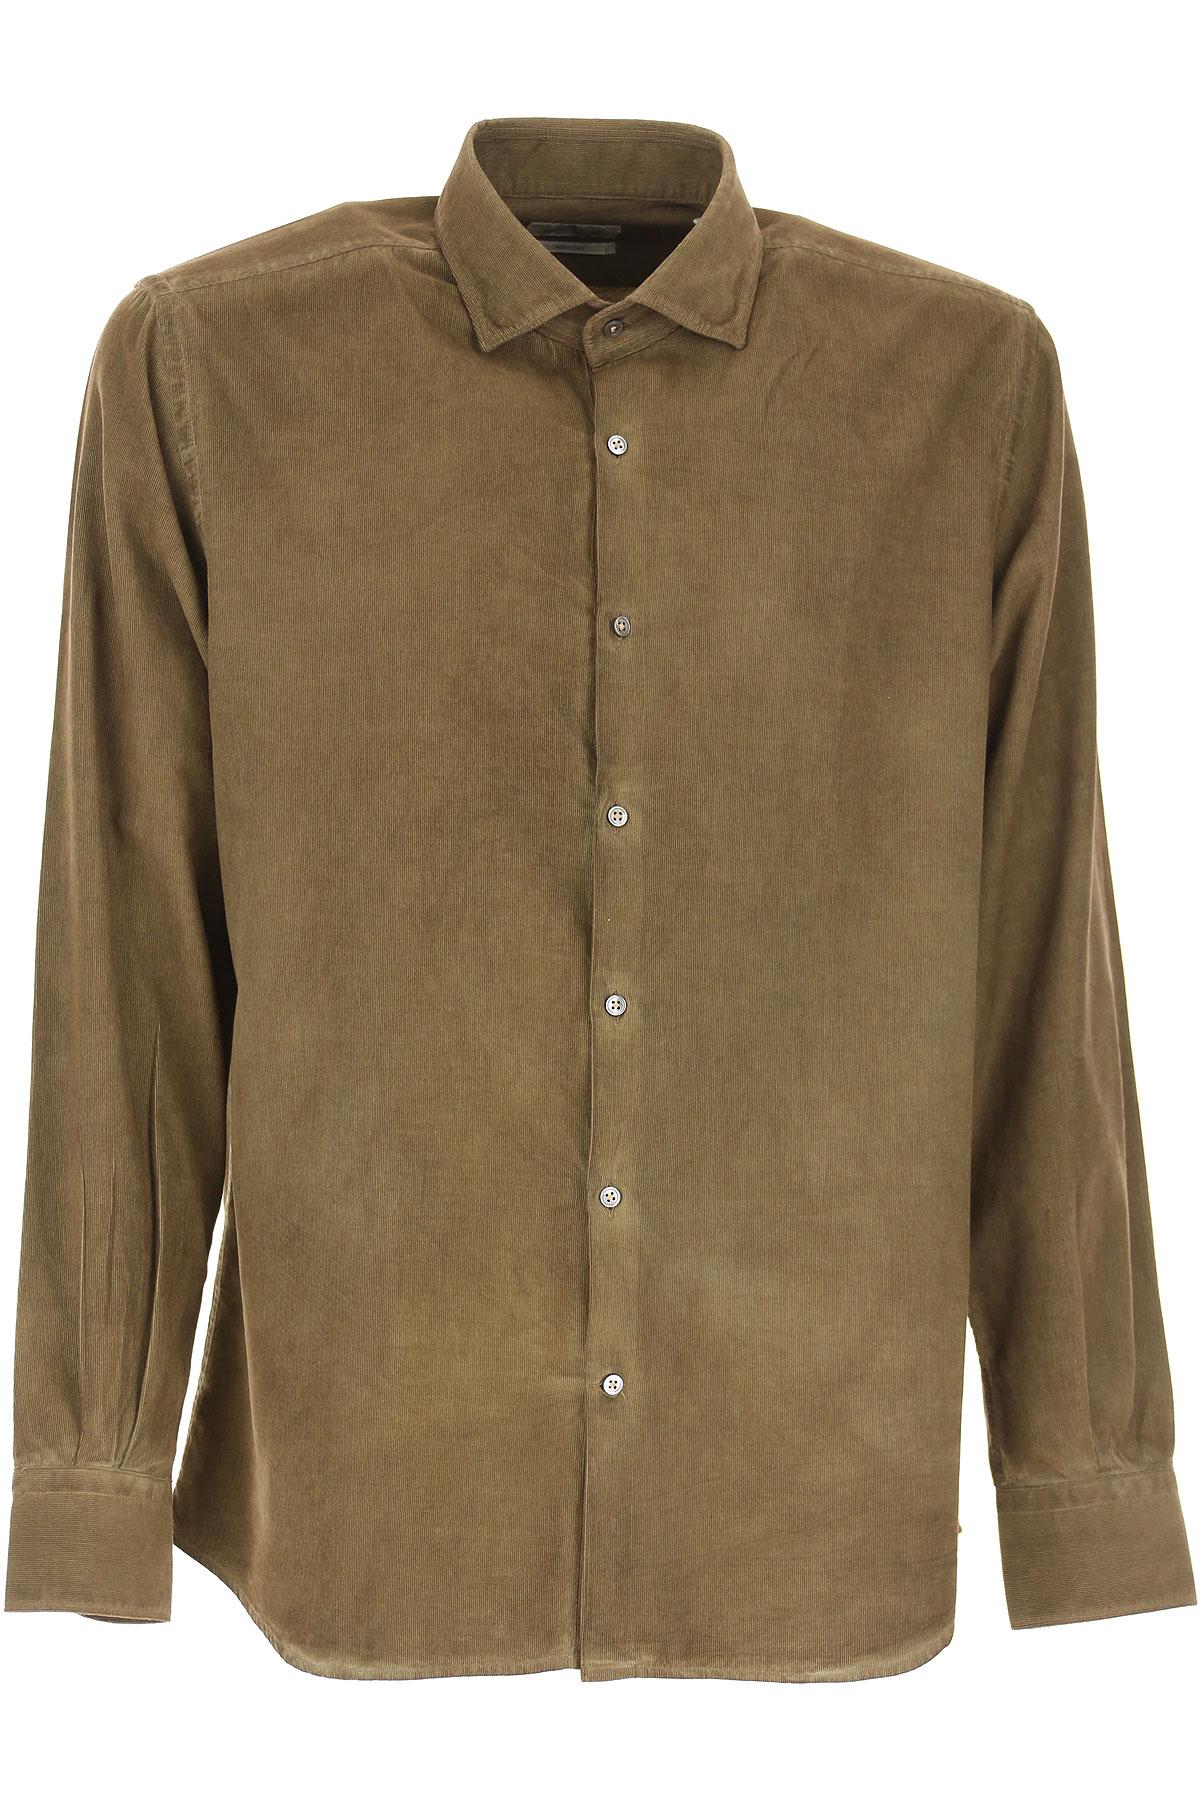 Brooksfield Shirt for Men On Sale, Mud, Cotton, 2019, 15.5 15.75 16 17